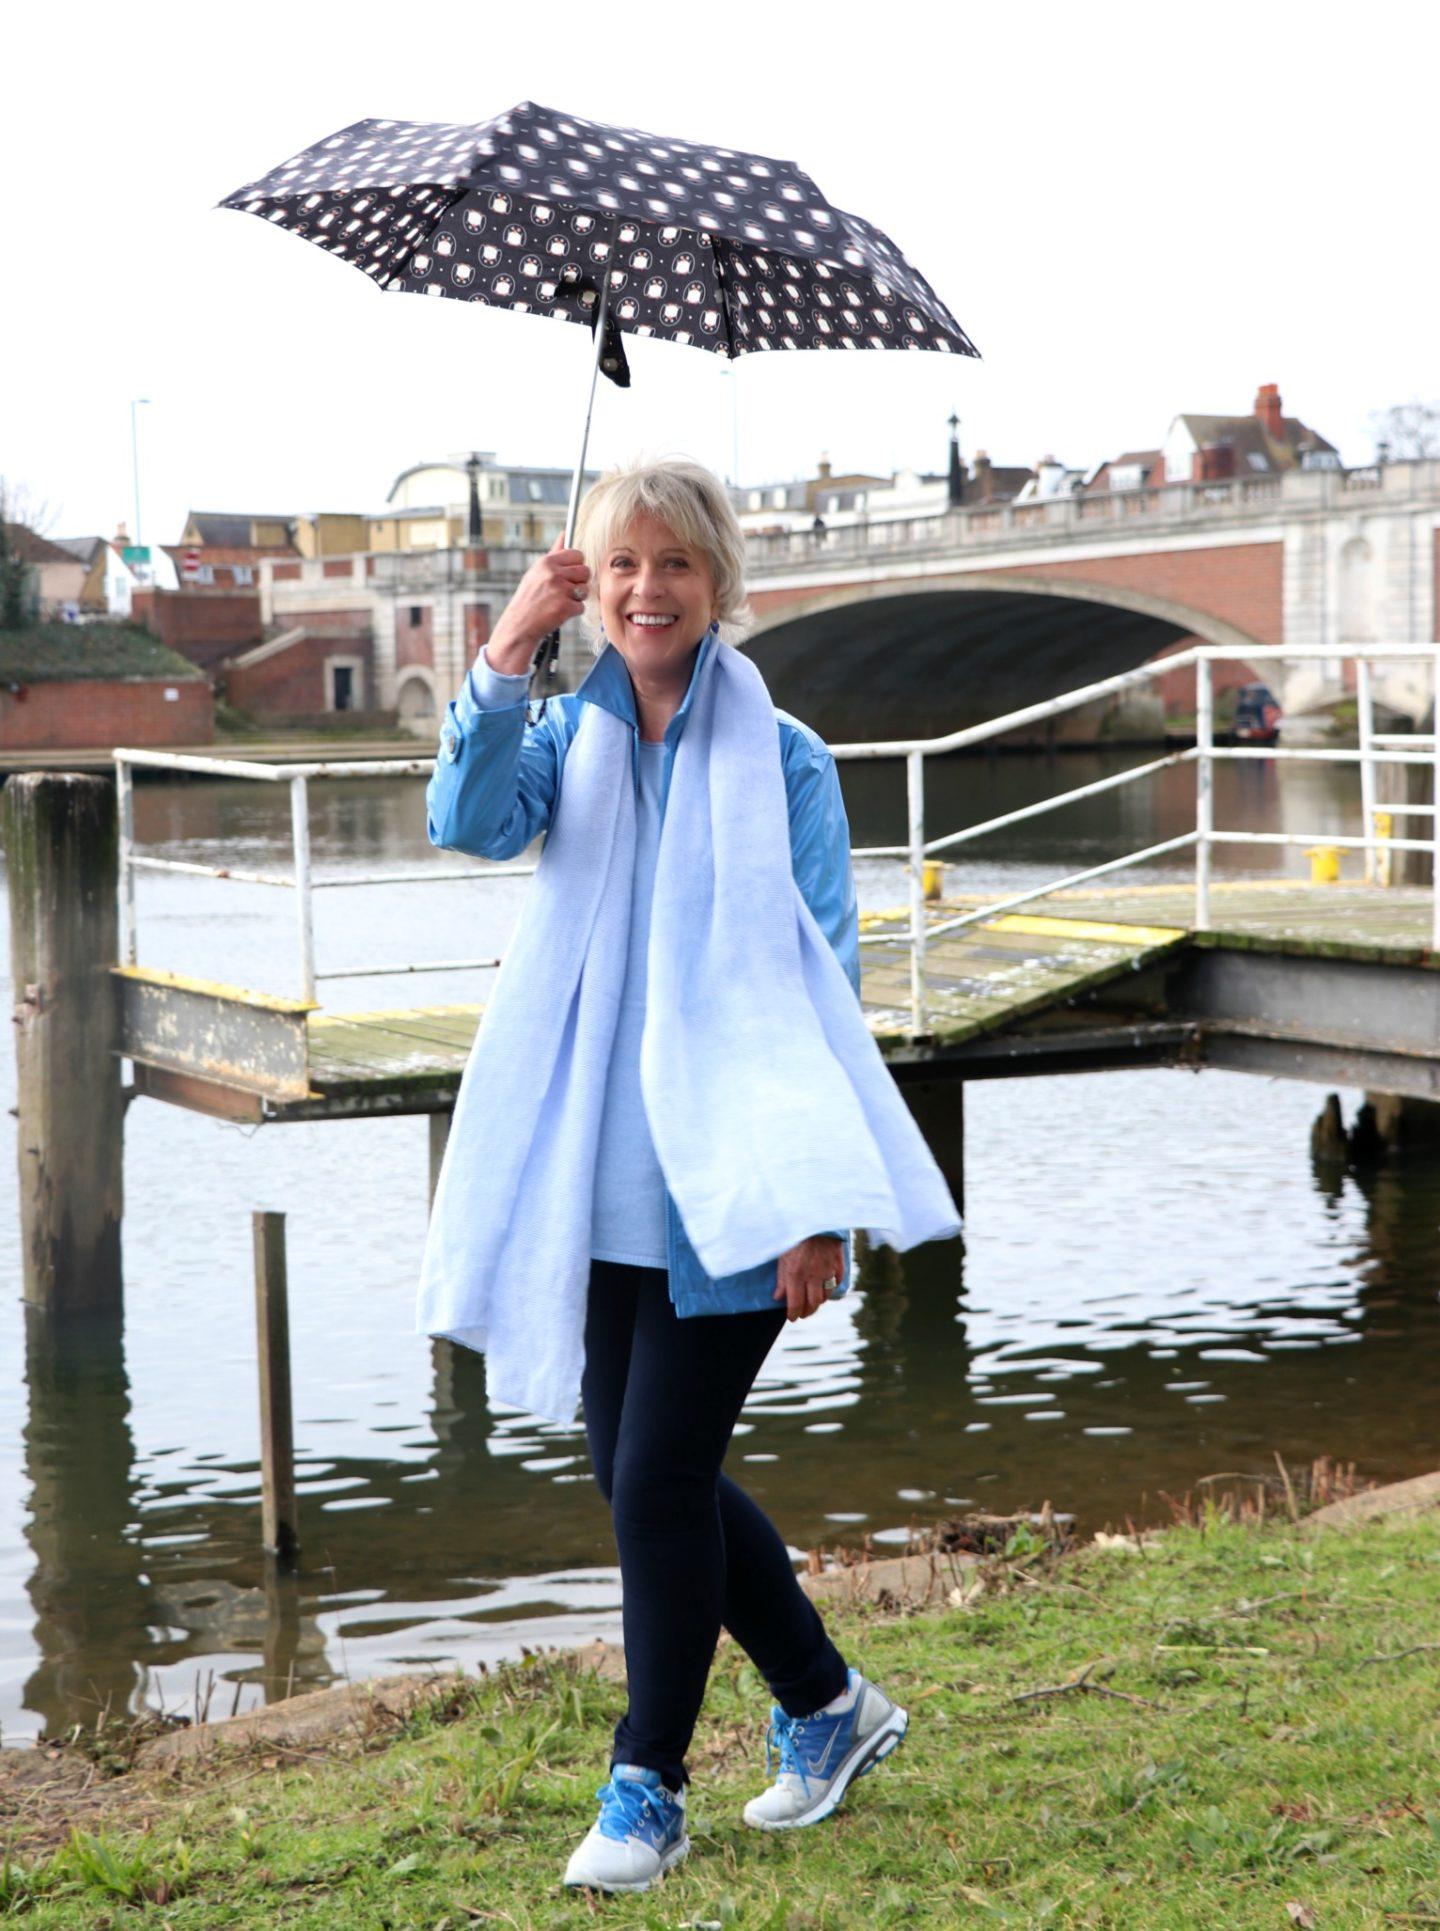 Singing in the rain  Spring raincoats